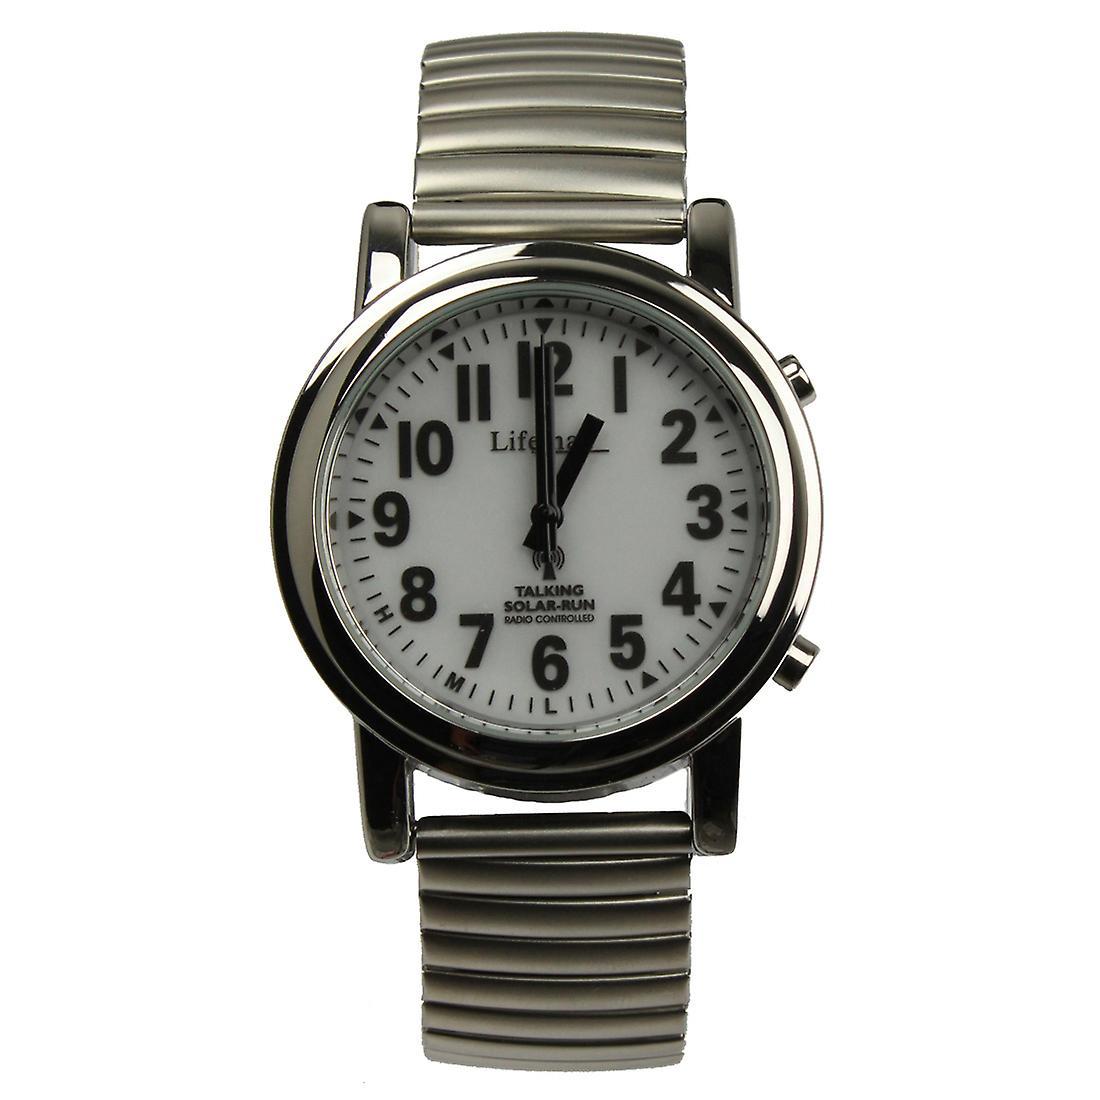 Talking Solar Atomic Watch - Expandable Bracelet